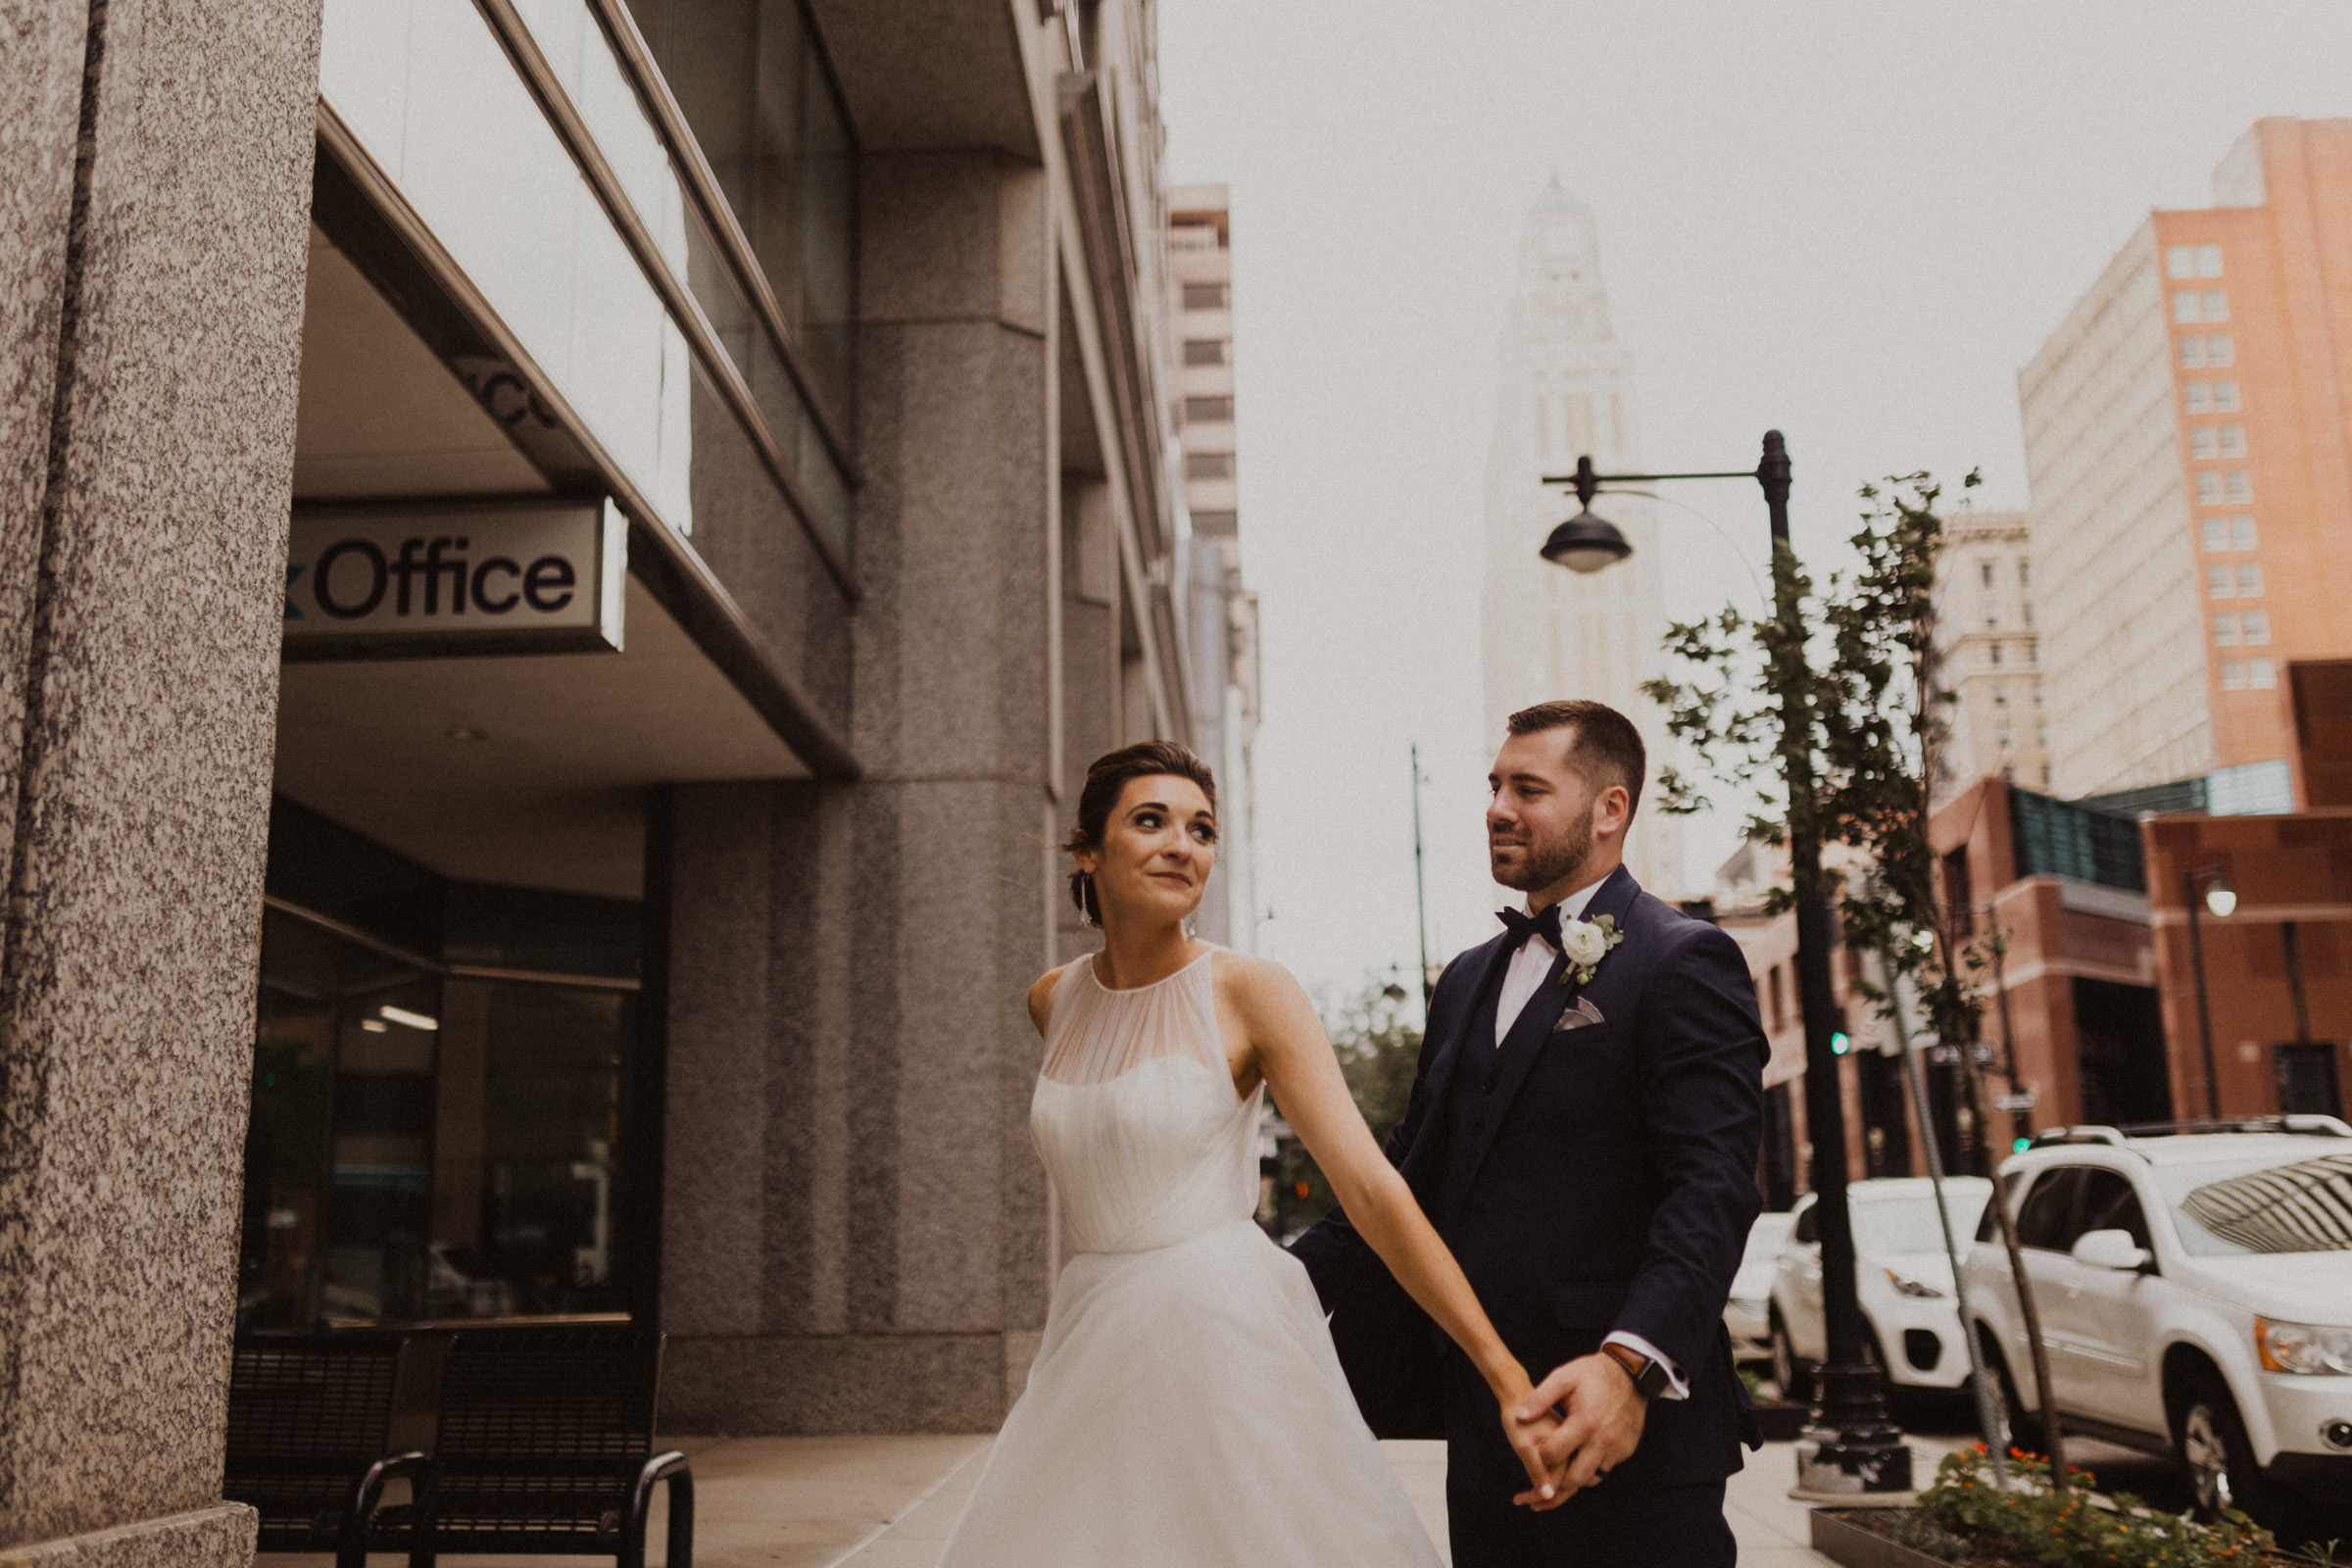 alyssa barletter photography classic downtown kansas city wedding boulevard brewery-46.jpg